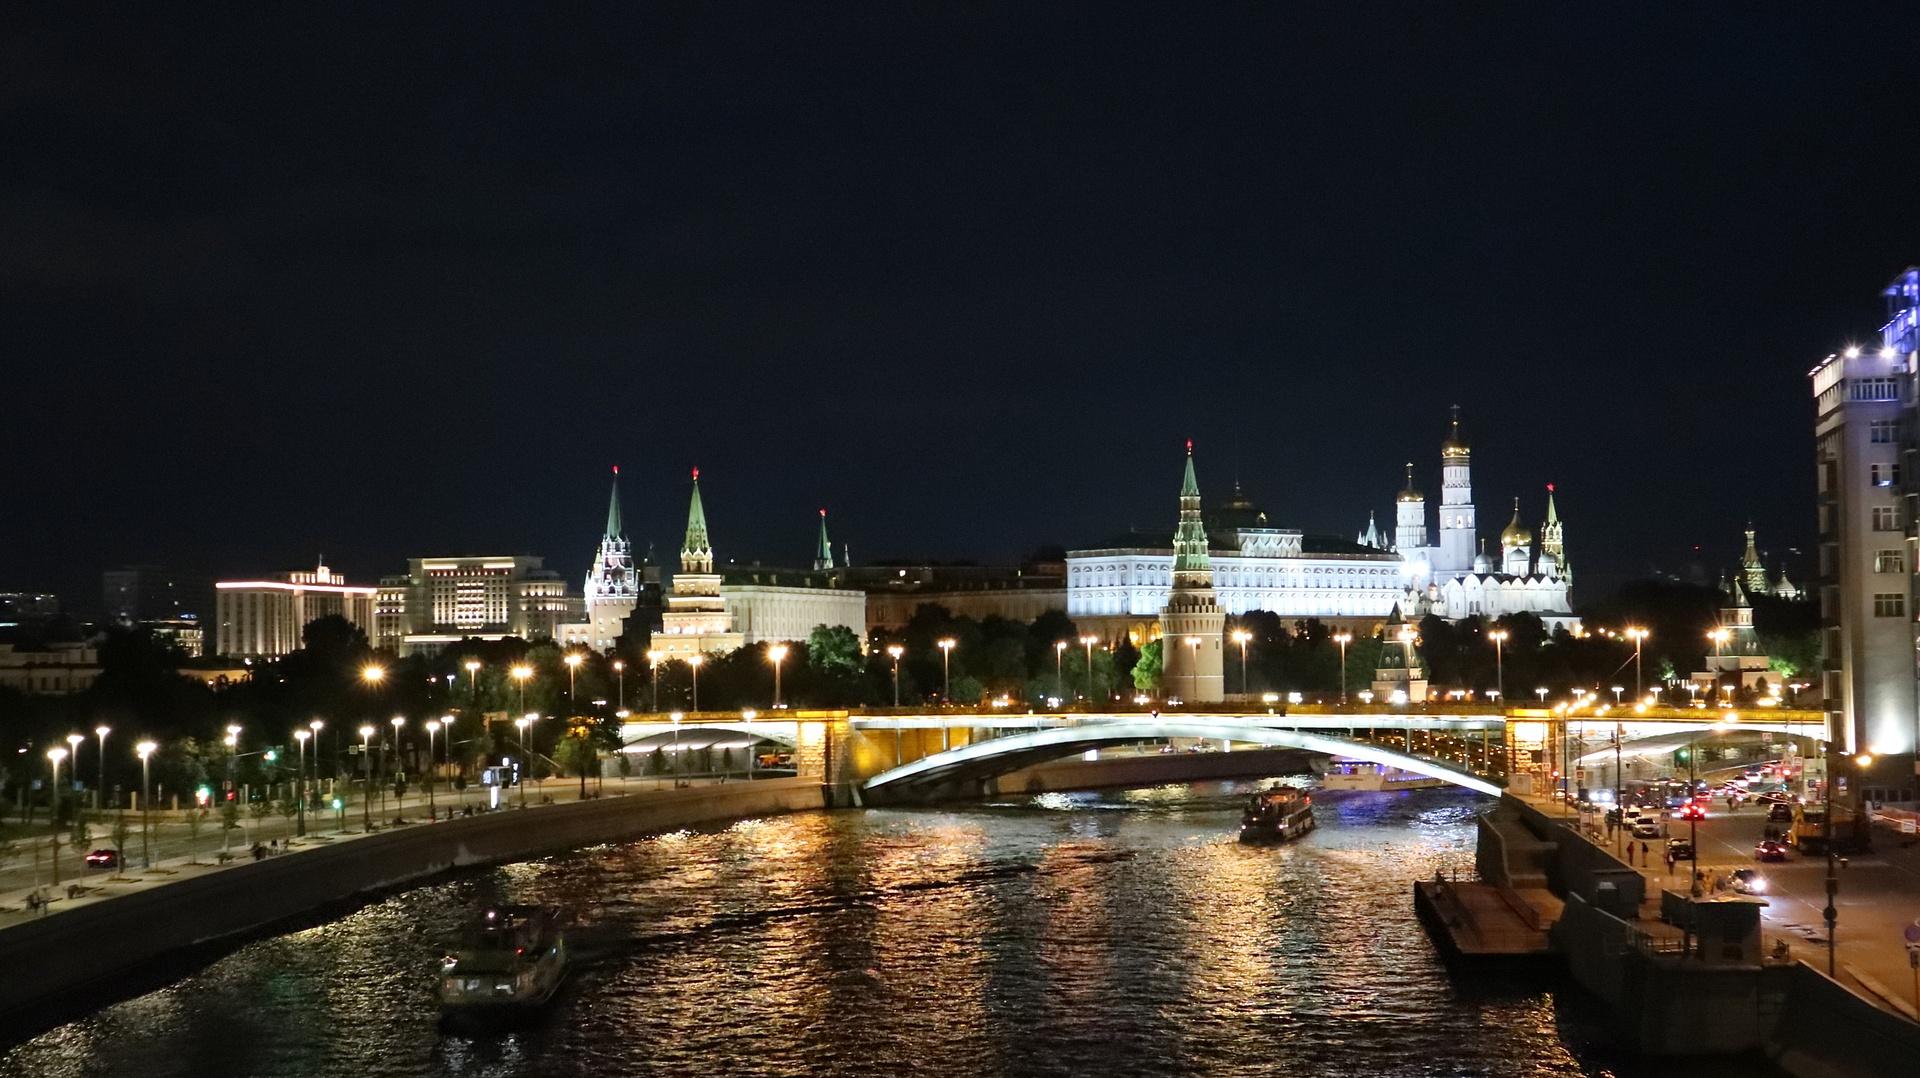 Valeriy's Gallery